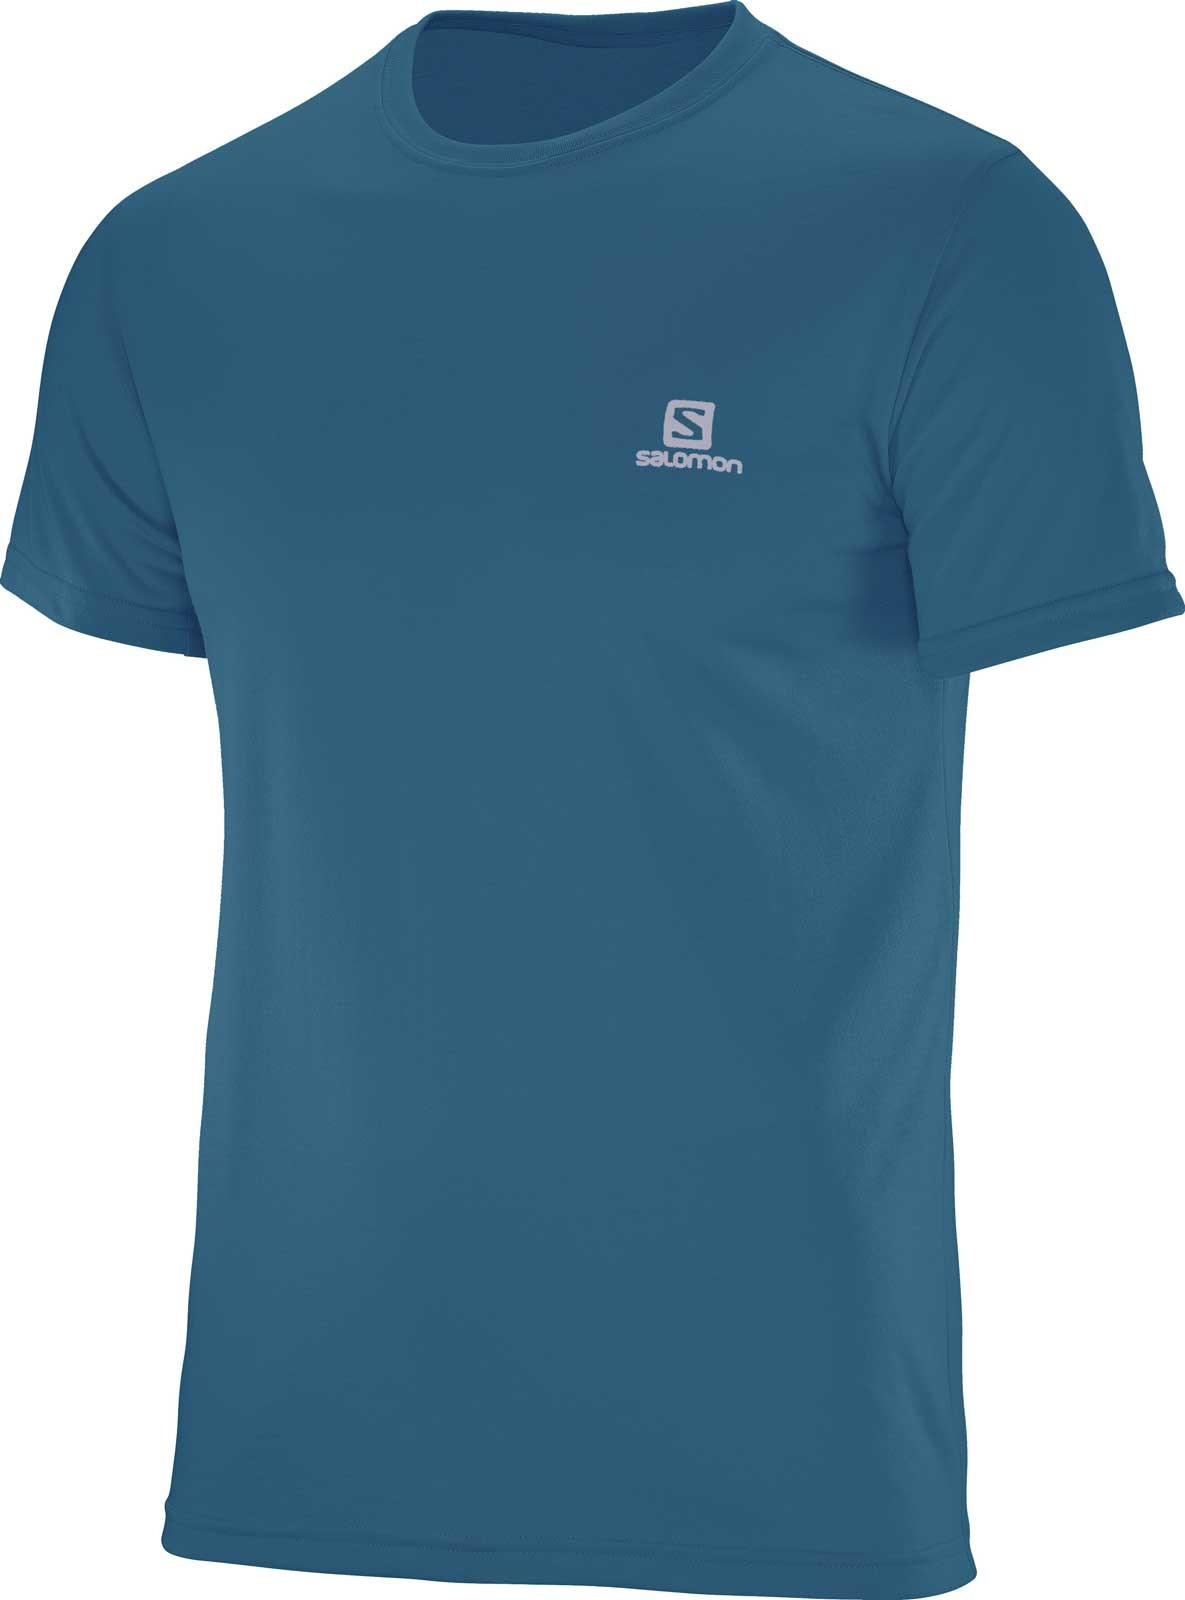 Camiseta Trail Running Training I SS  Masculina Salomon